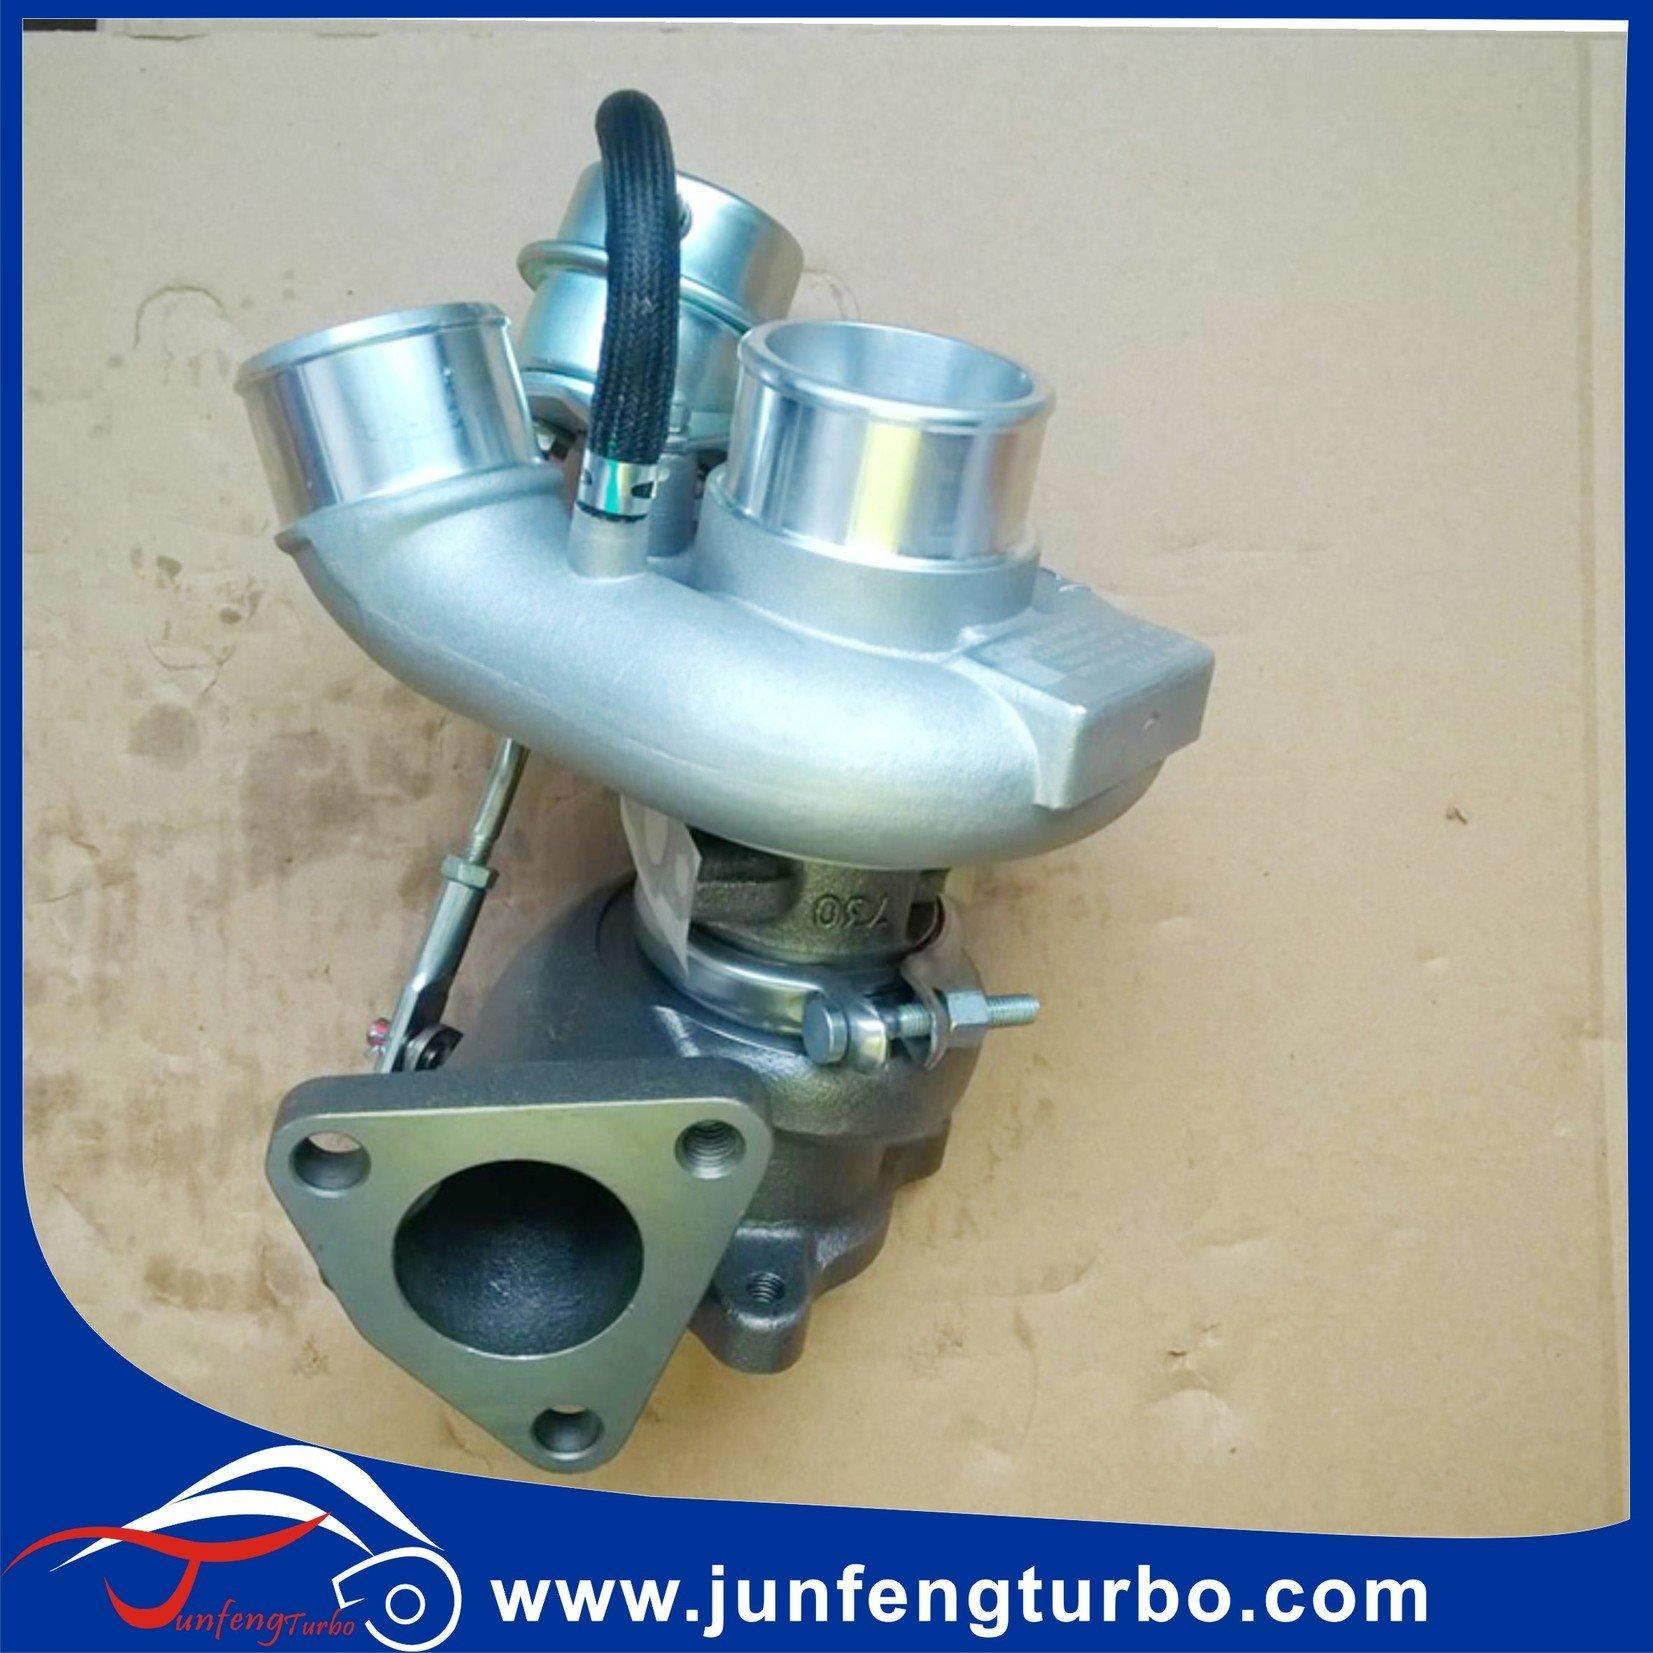 TD04H turbo 1118100-ED09 turbocharger 49389-05610 Great Wall